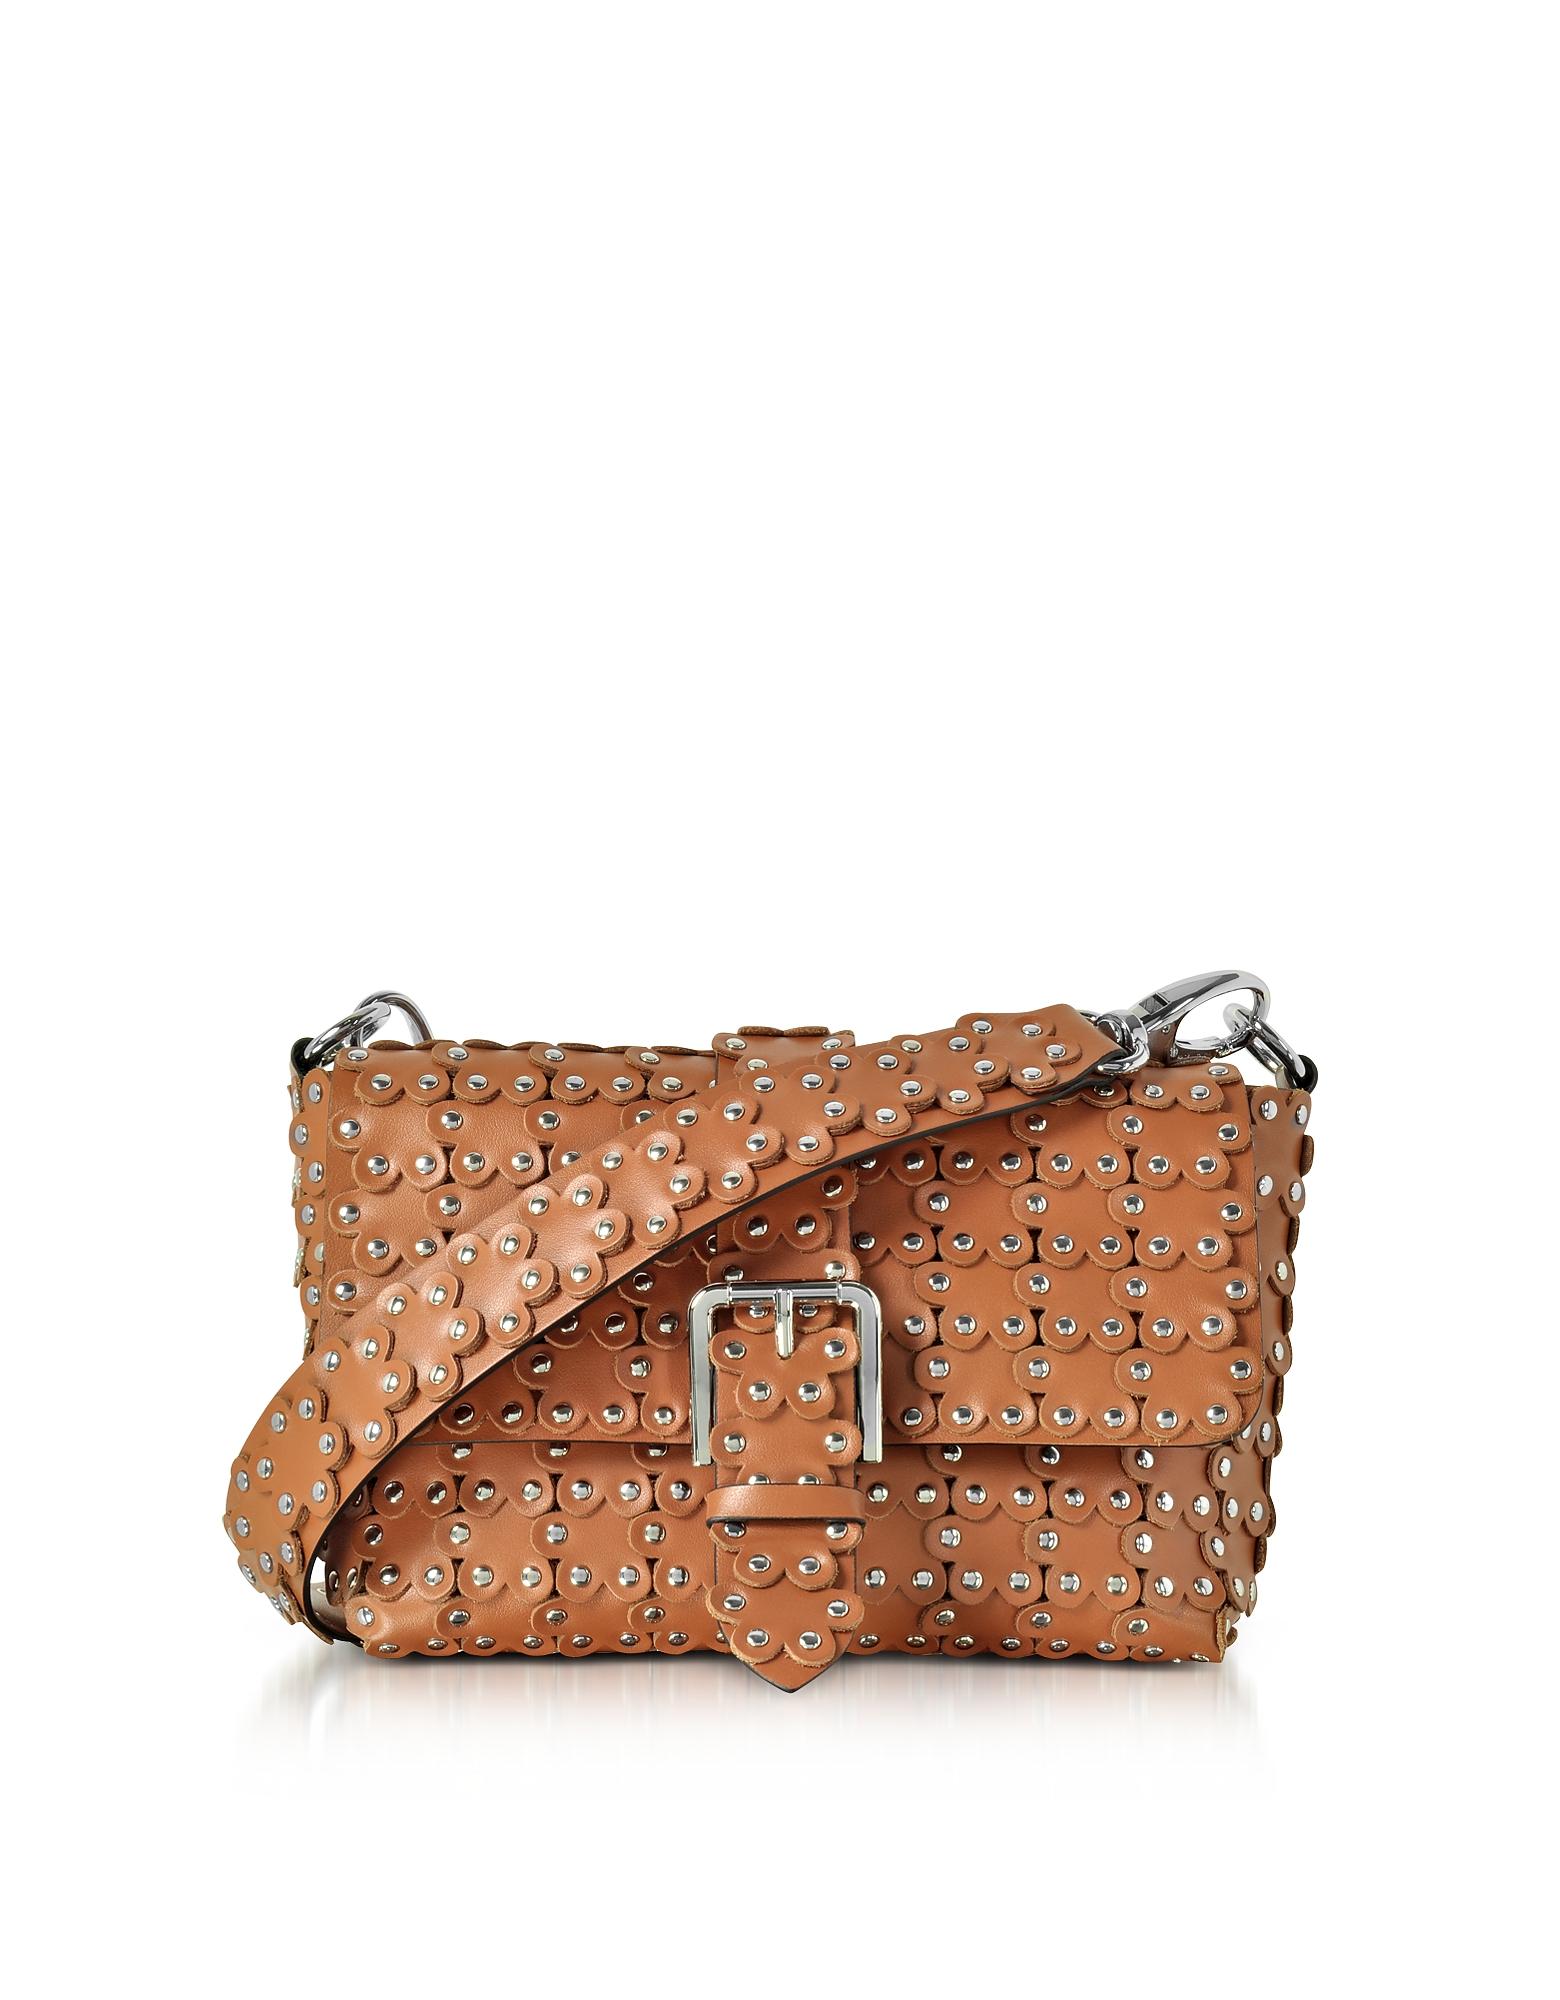 RED Valentino Handbags, Studded Leather Flap Top Shoulder Bag